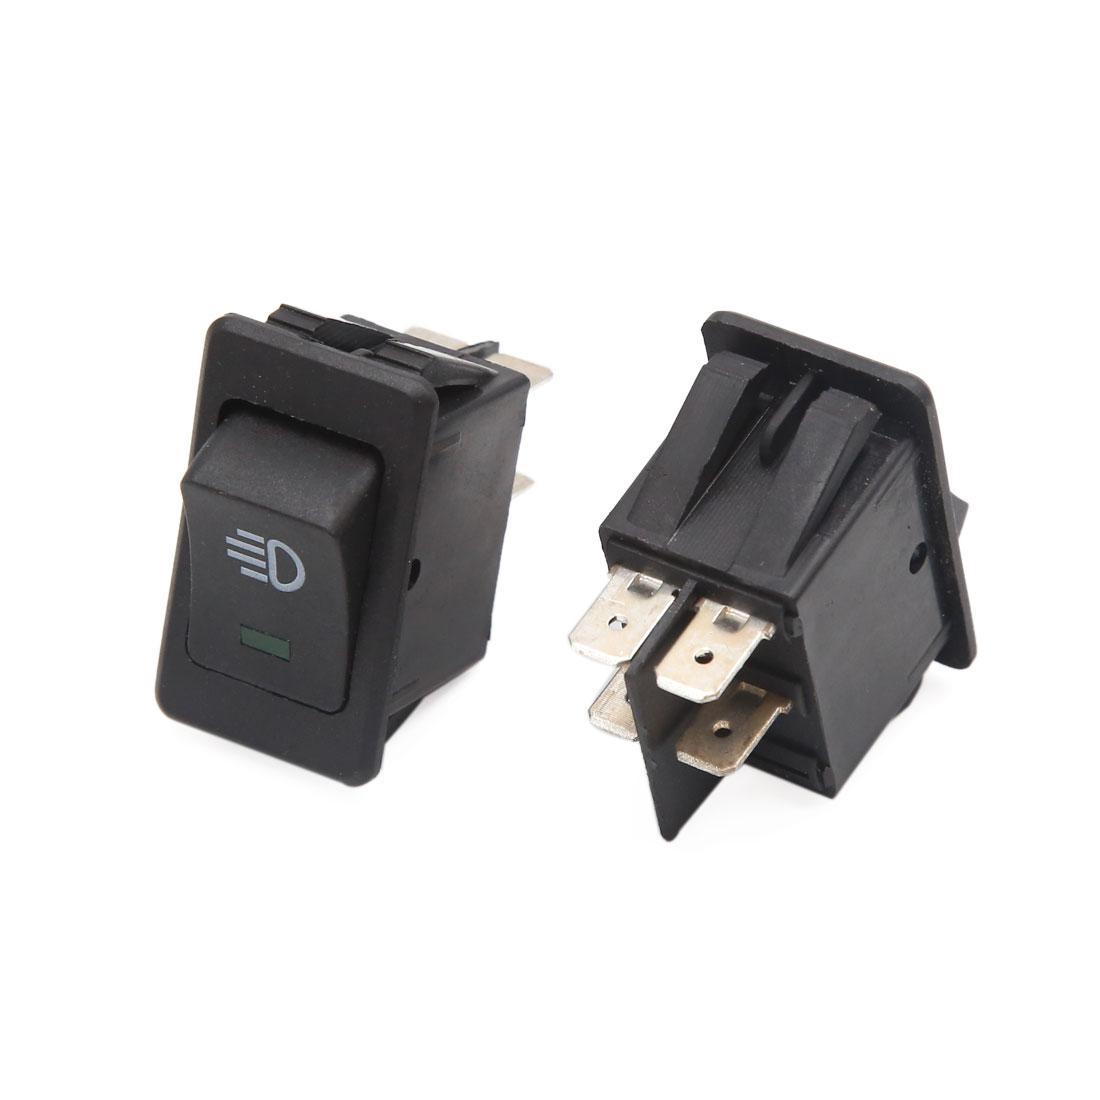 2pcs DC 12V 4 Pin Green LED Dashboard Fog Light Rocker Toggle Switch for Car